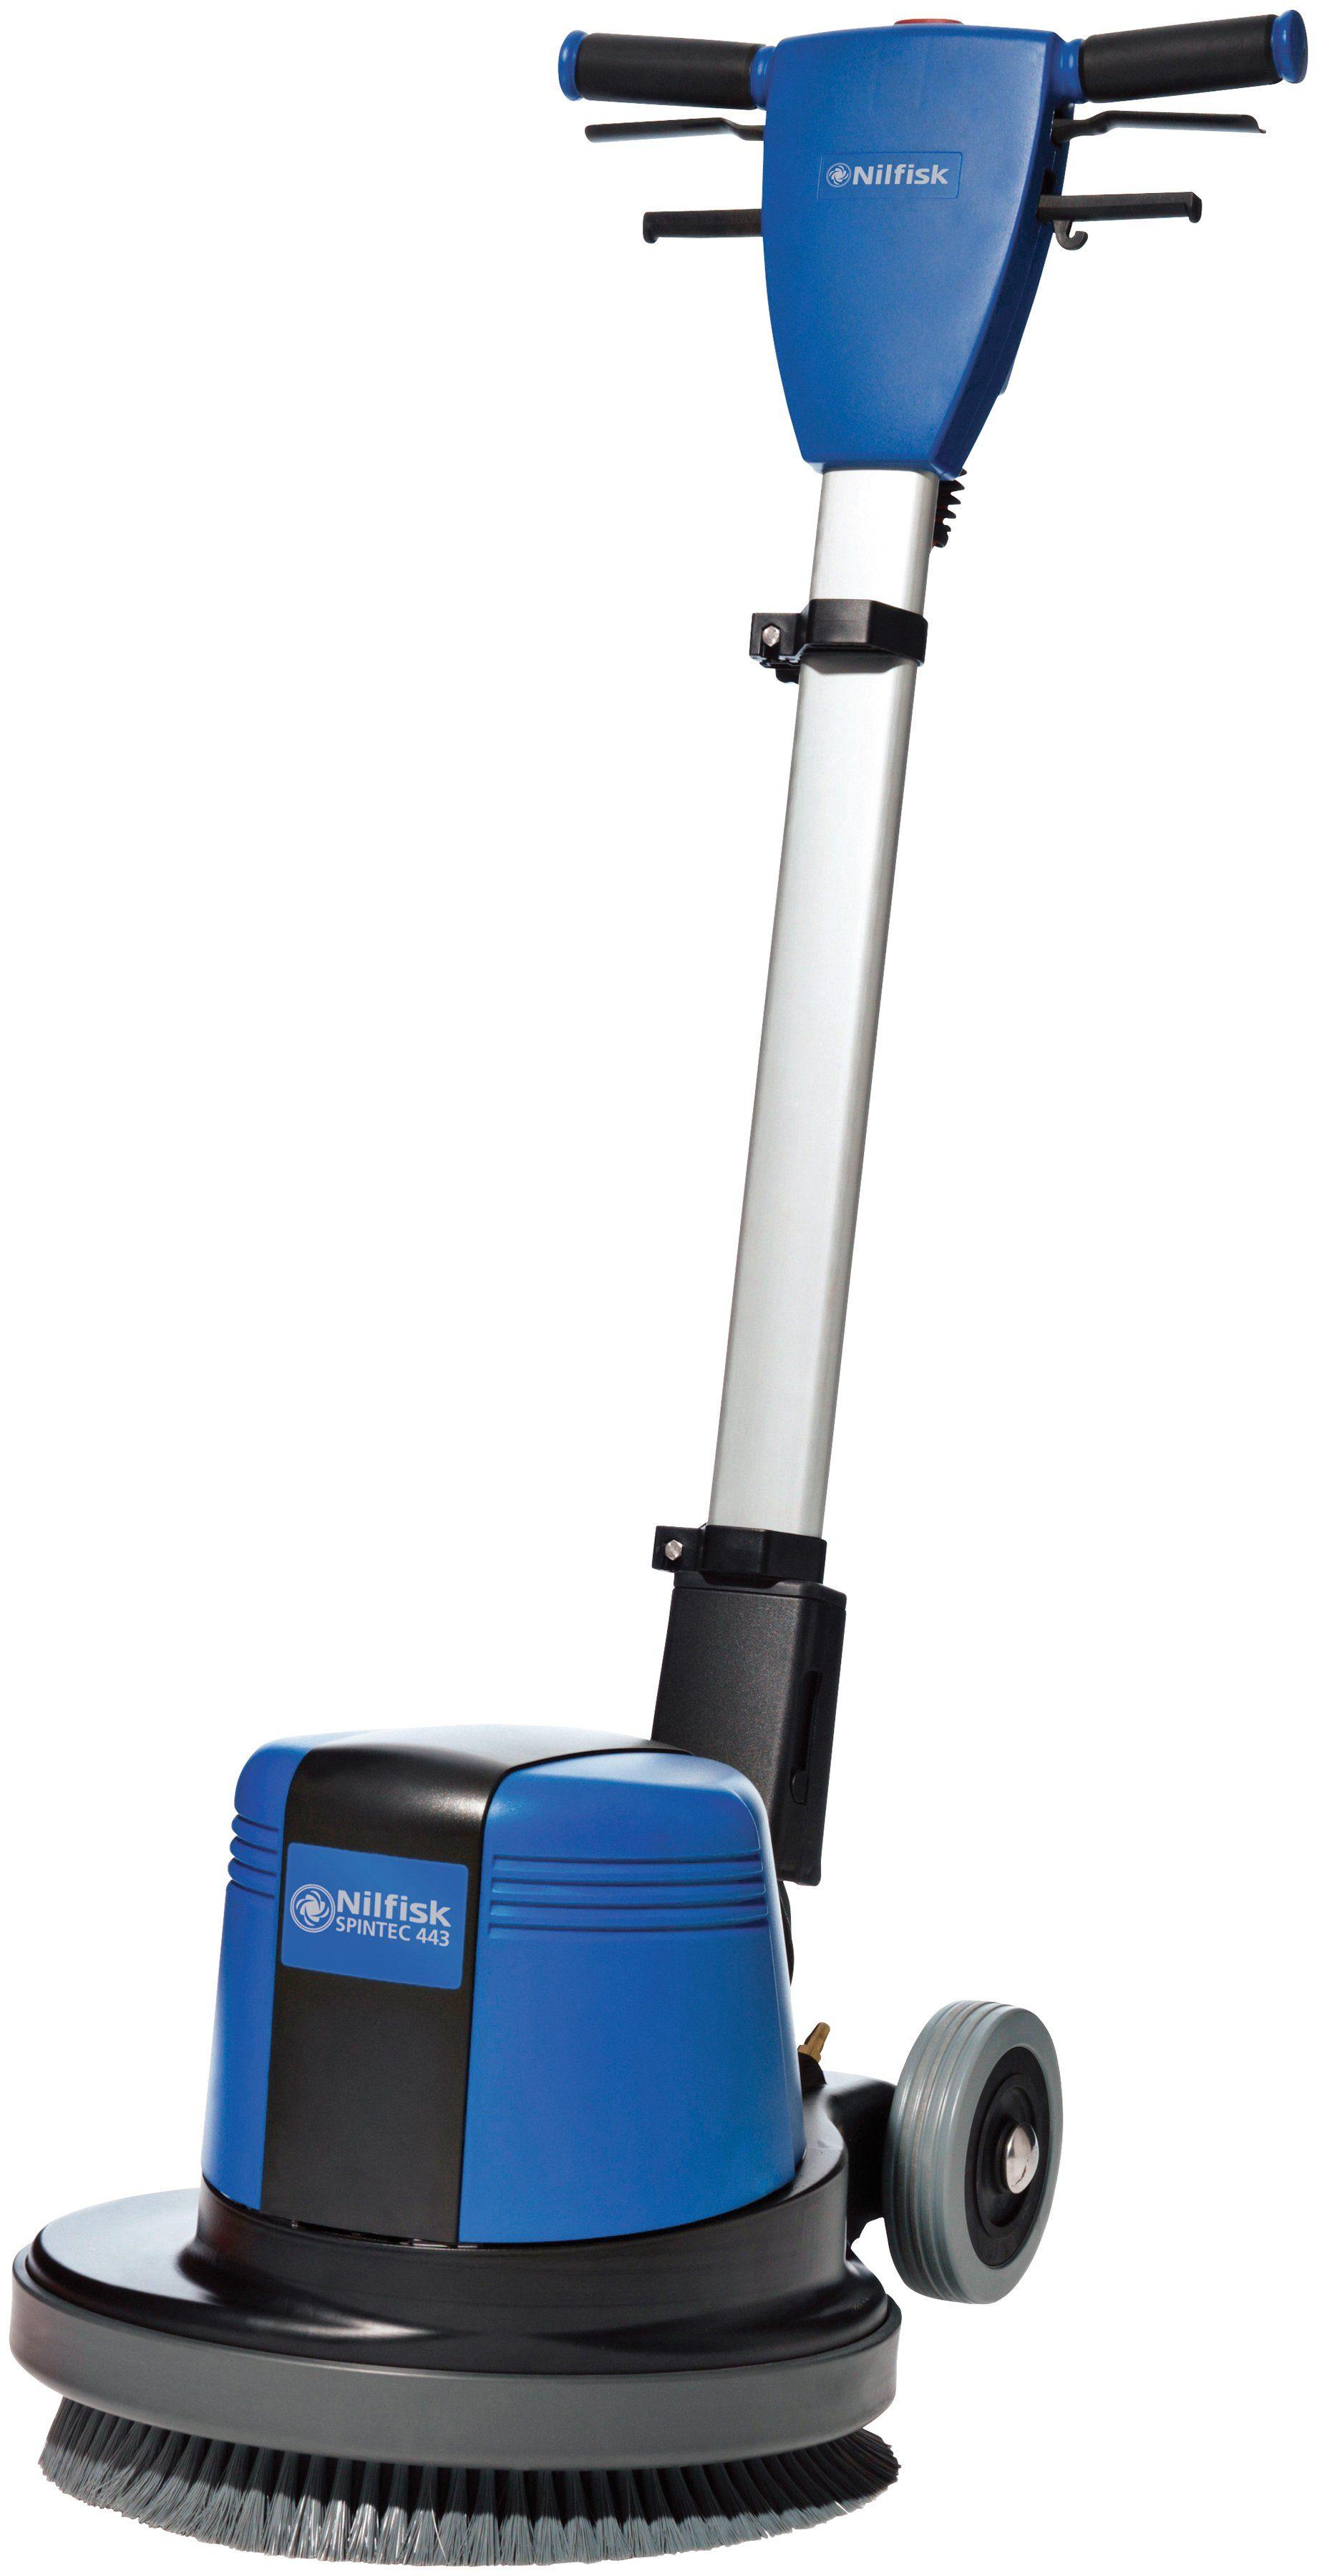 NILFISK Poliermaschine »SPINTEC 443«, (L/H/B): ca. 550x430x1100 mm